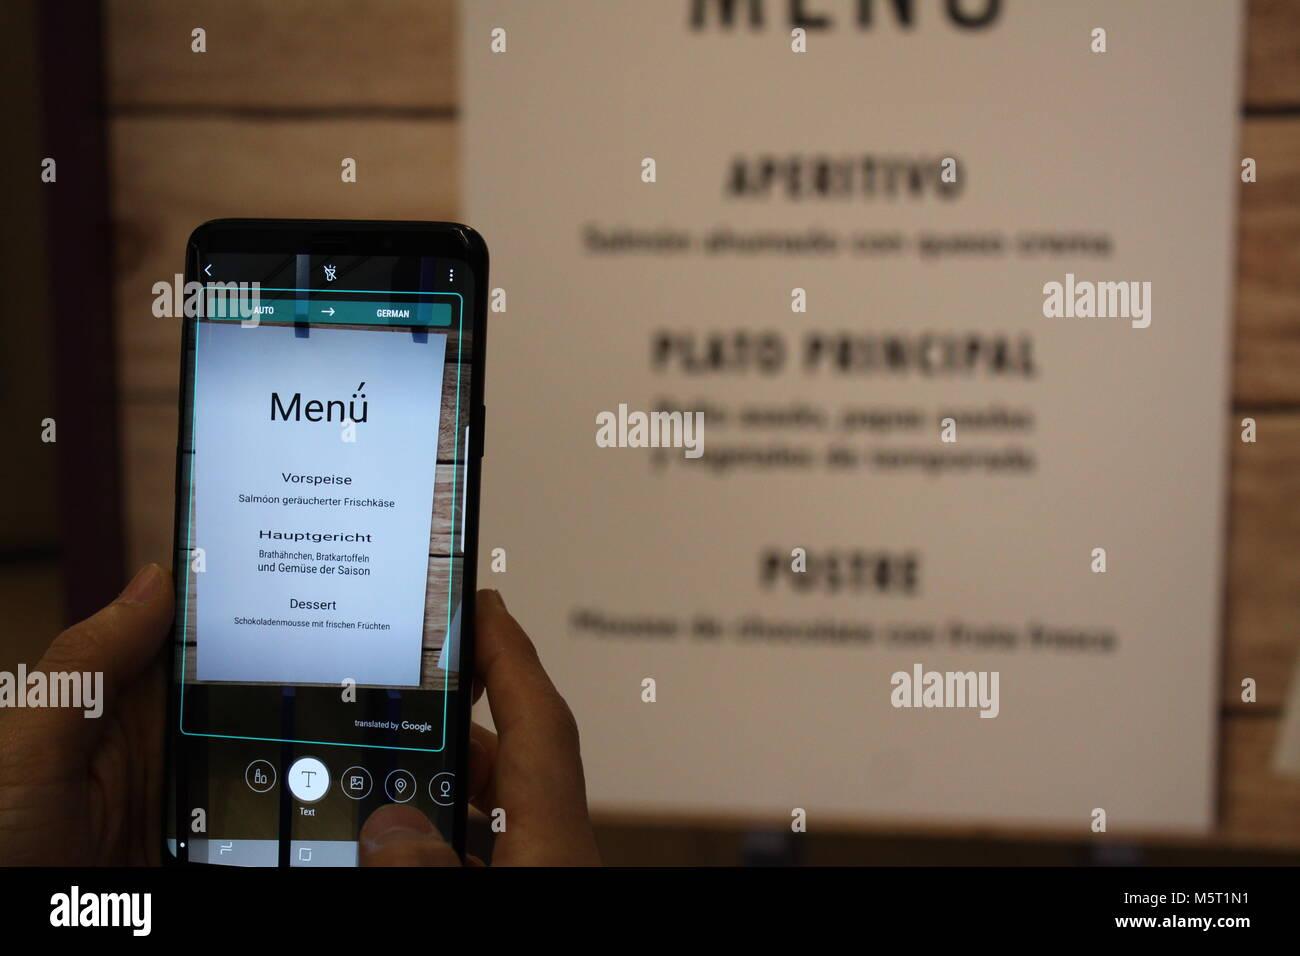 20 February 2018, England, London: The Bixby app can be seen